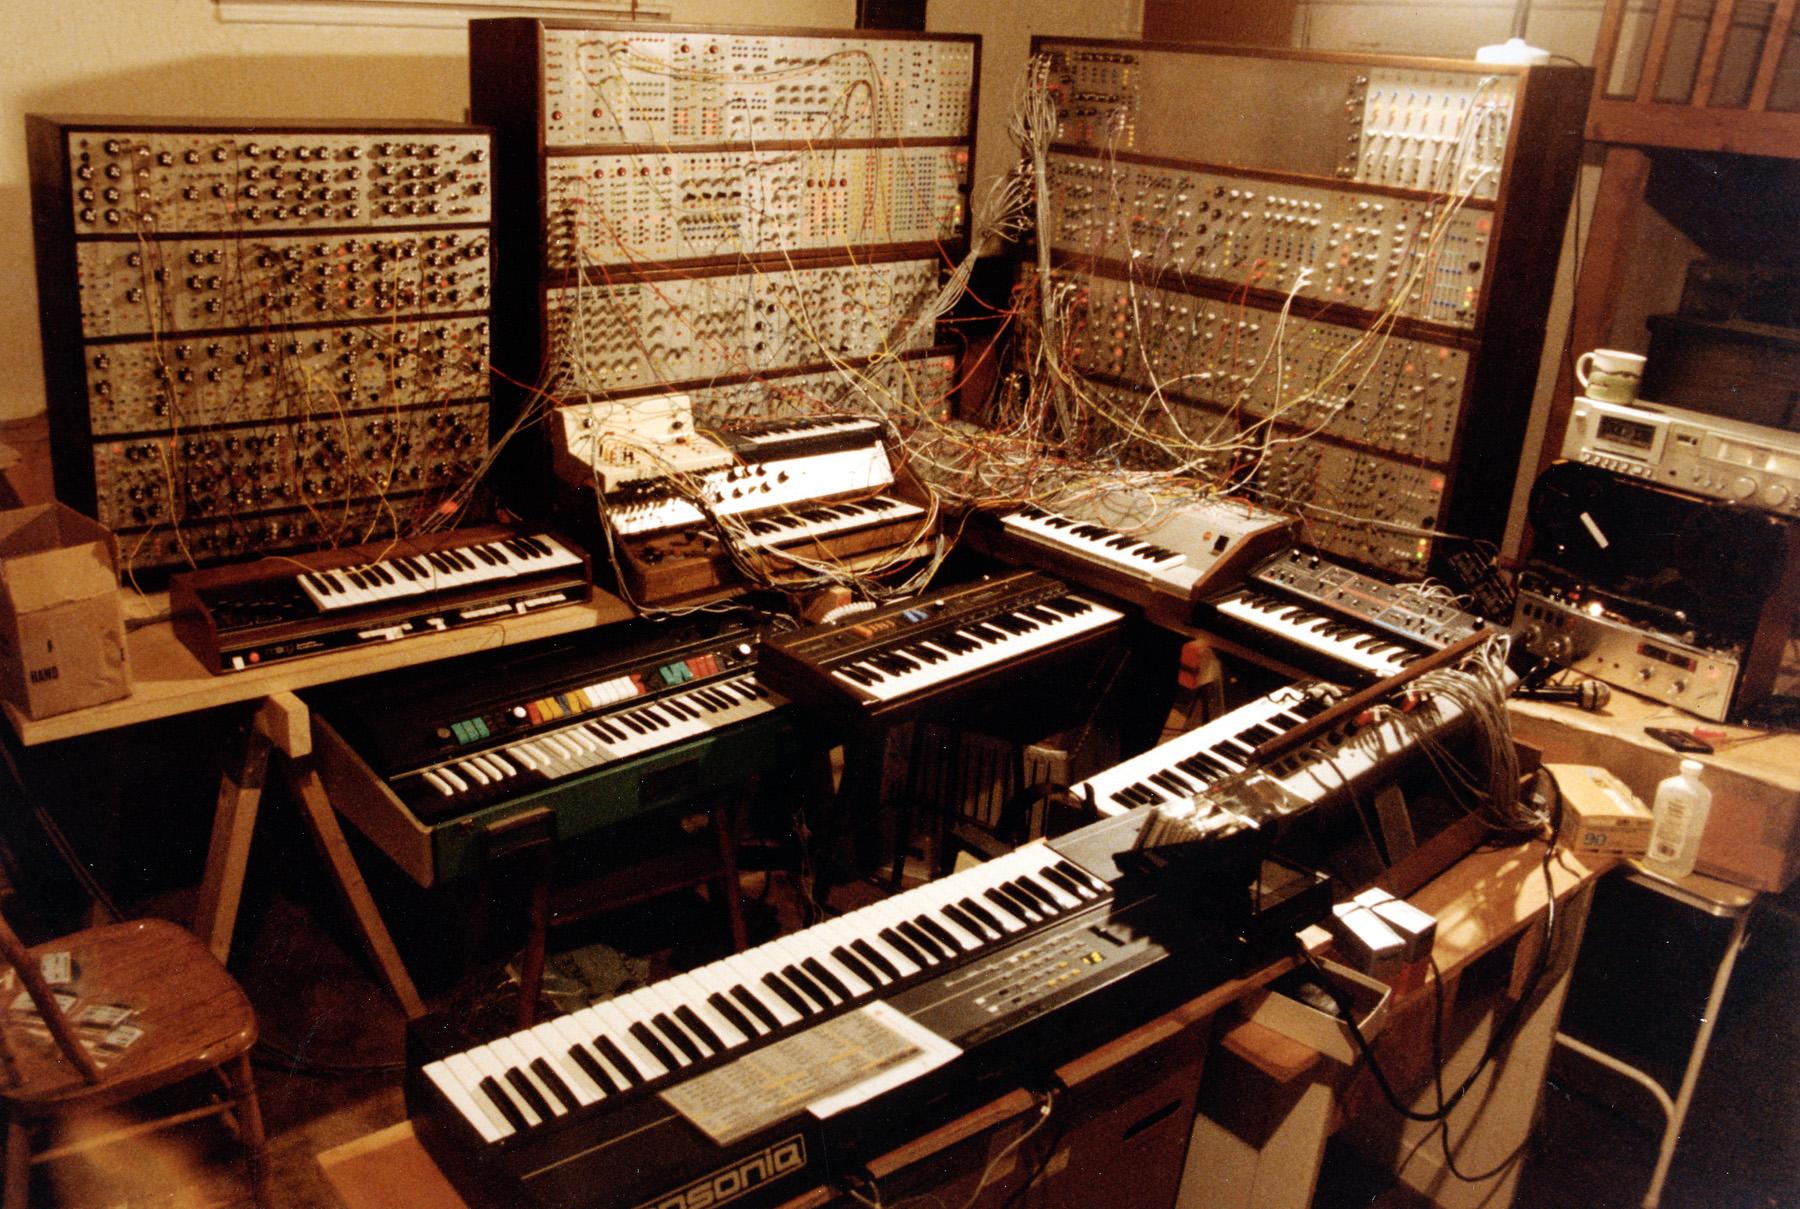 Synth modular